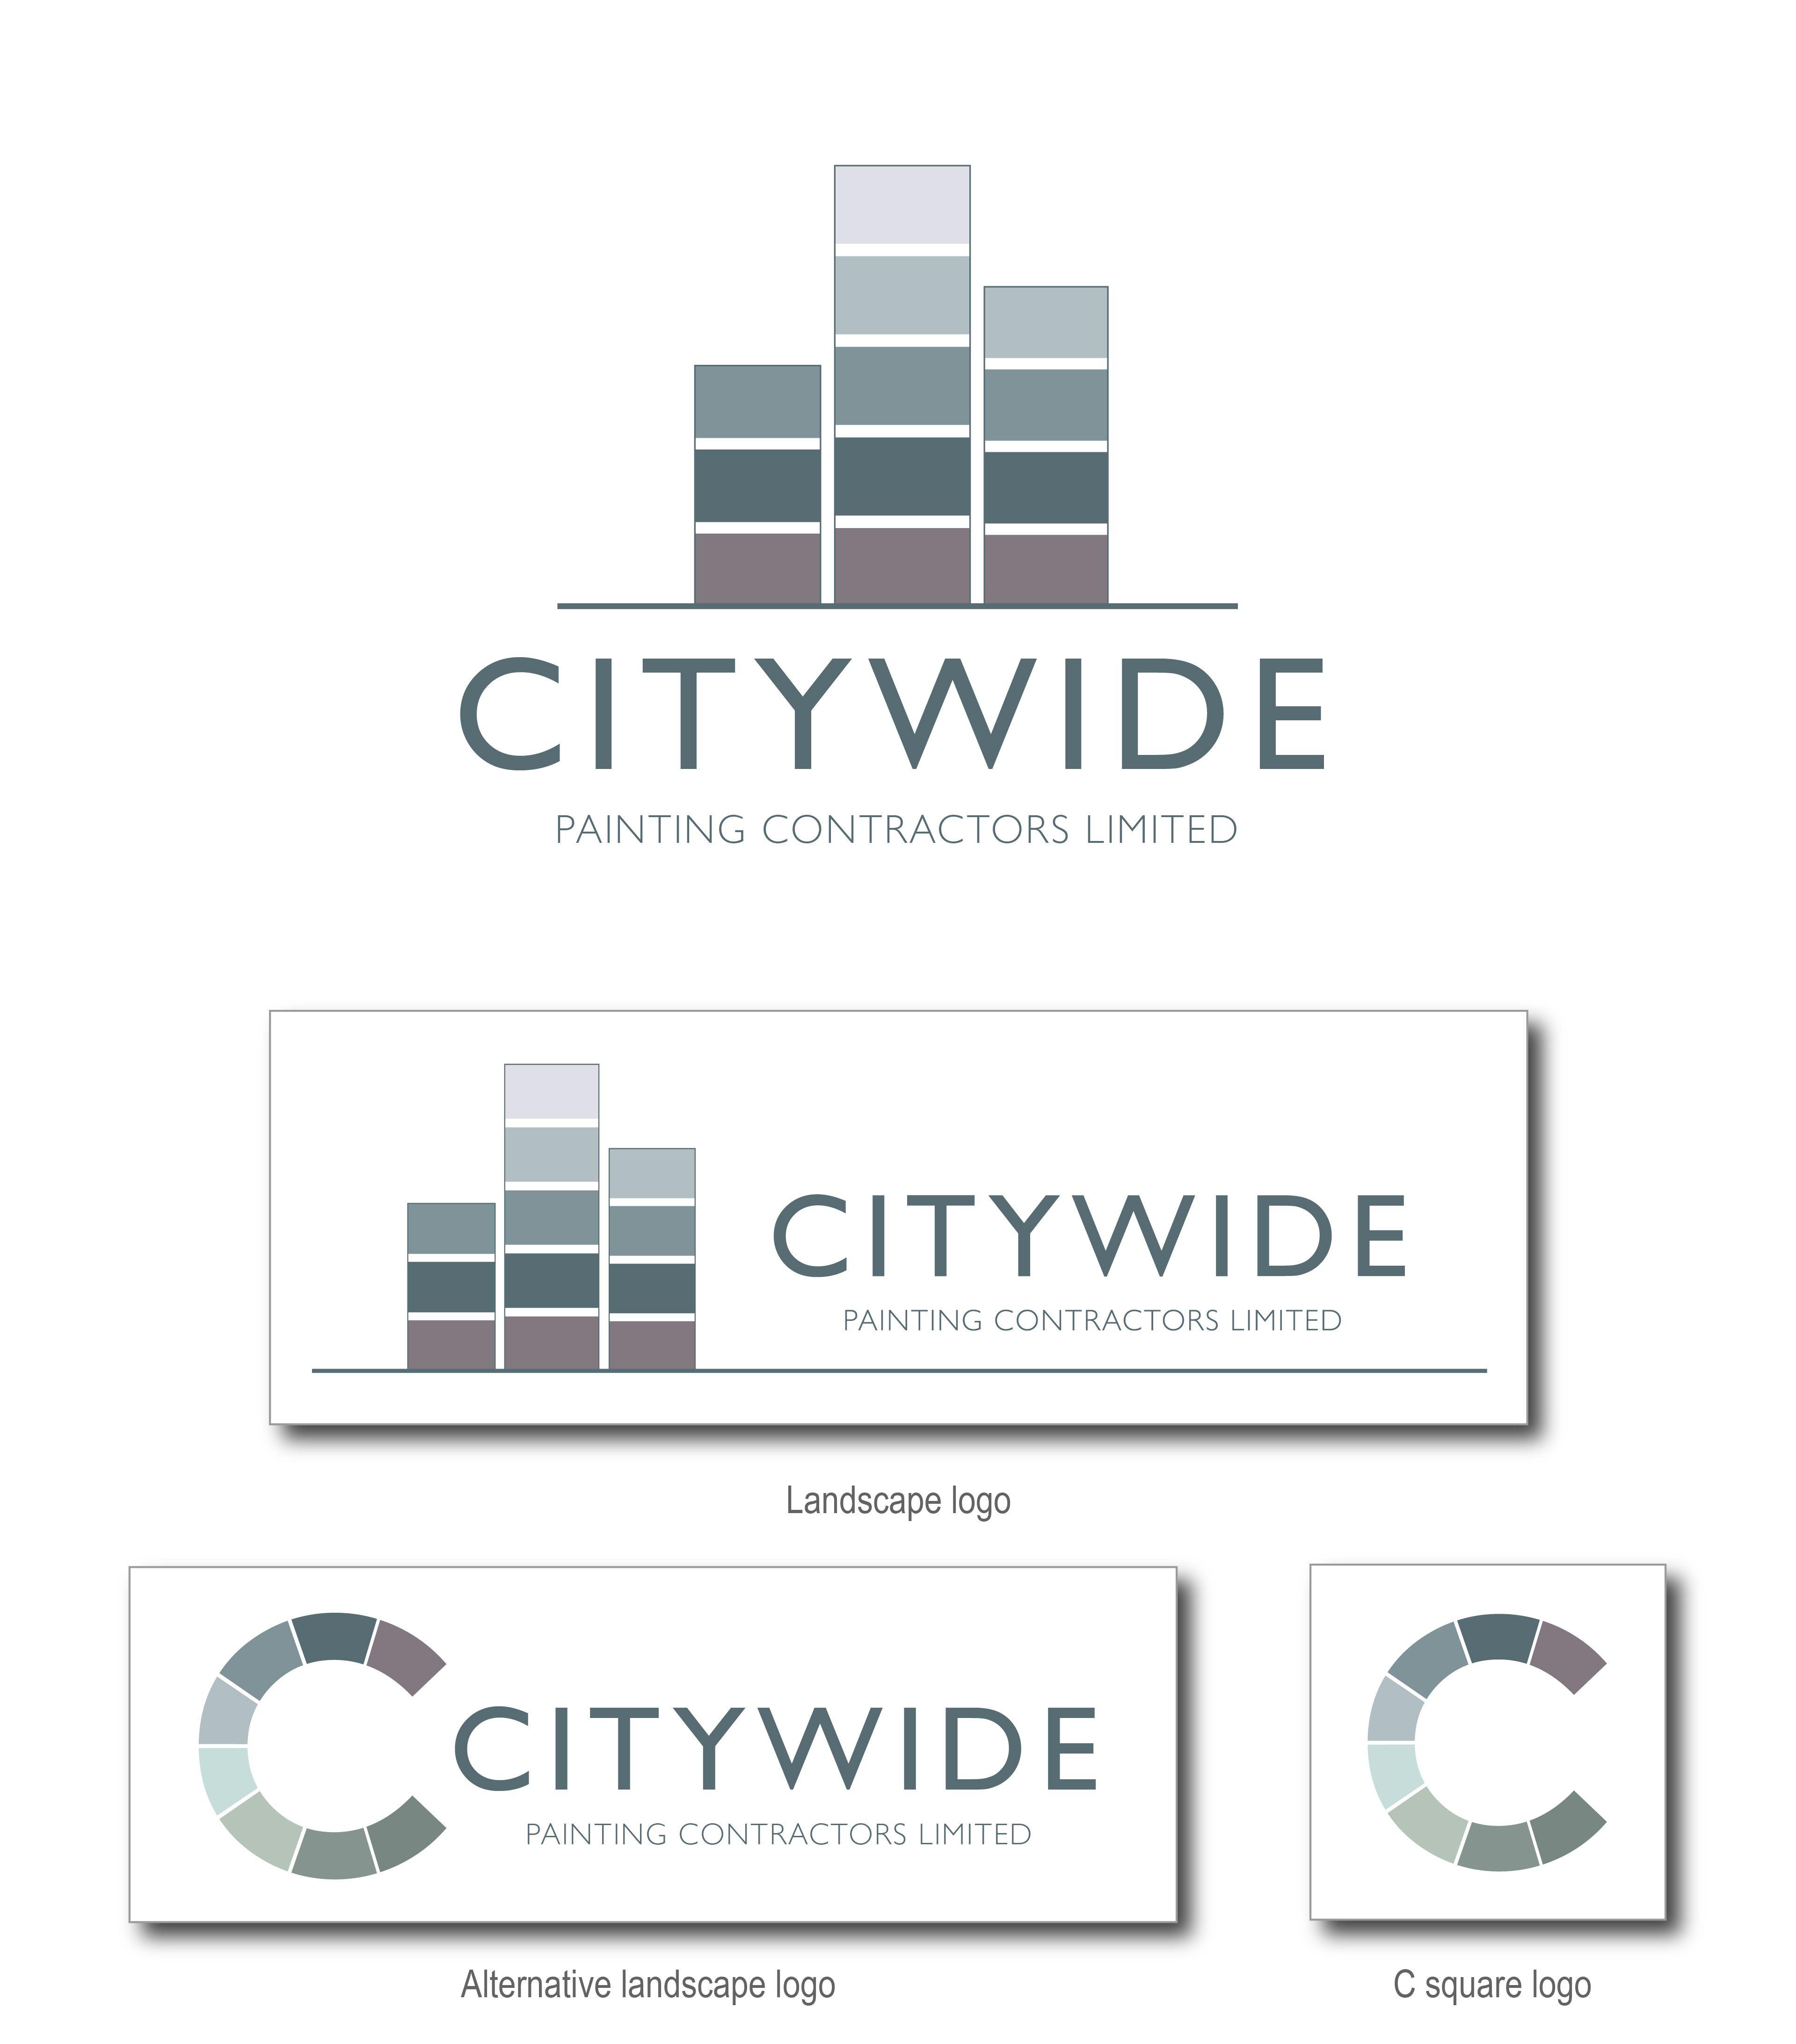 logo design branding for citywide painting contractors my